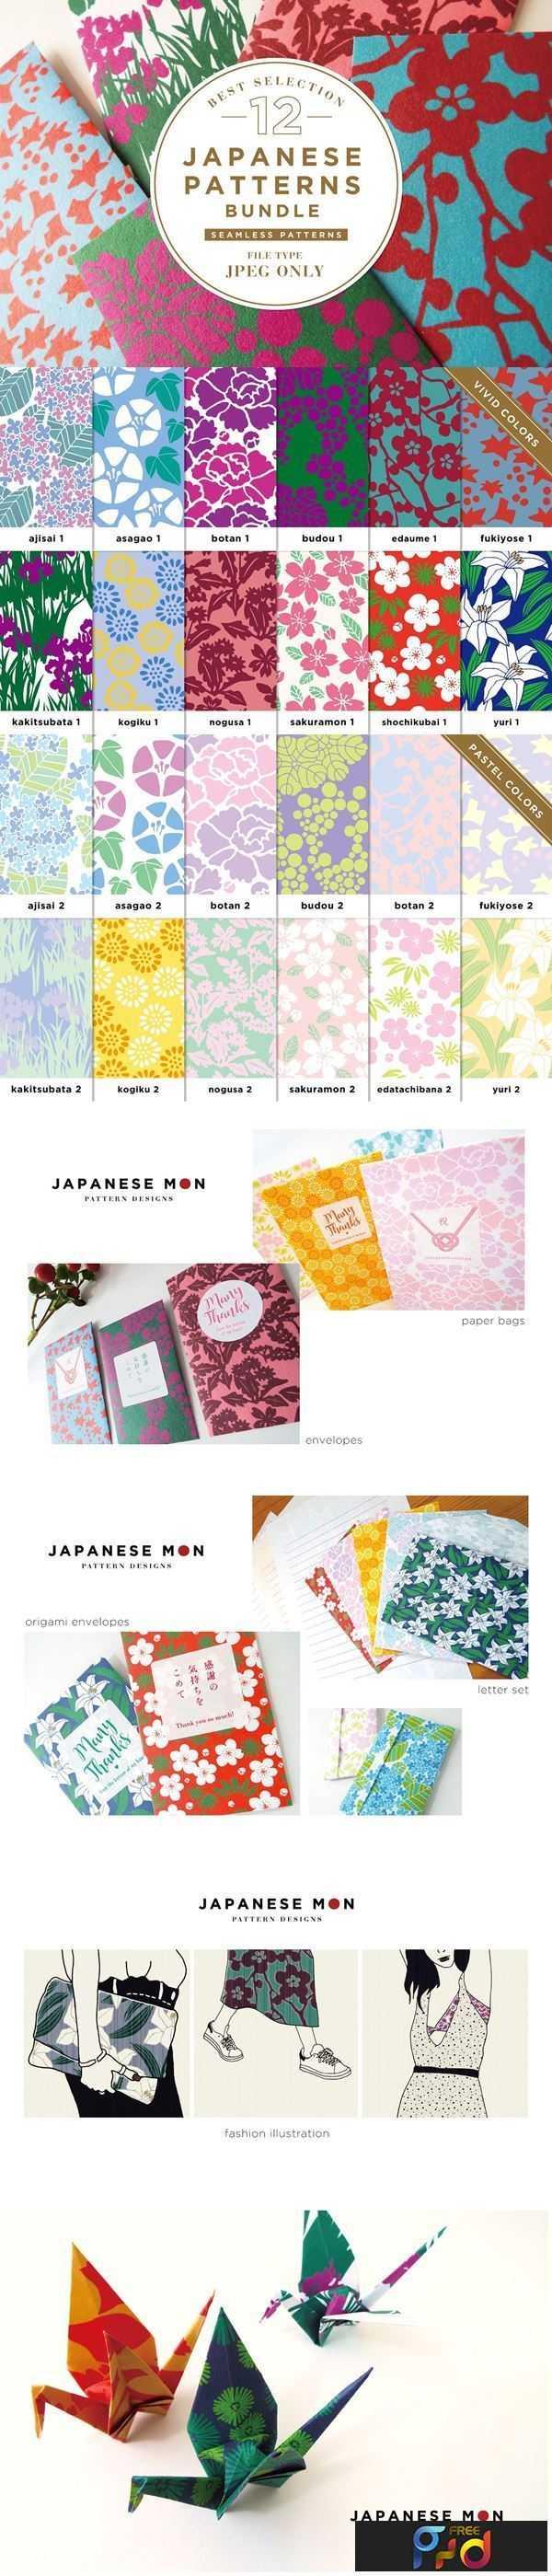 1807015 12 BEST JAPANESE PATTERNS BUNDLE 1185524 1